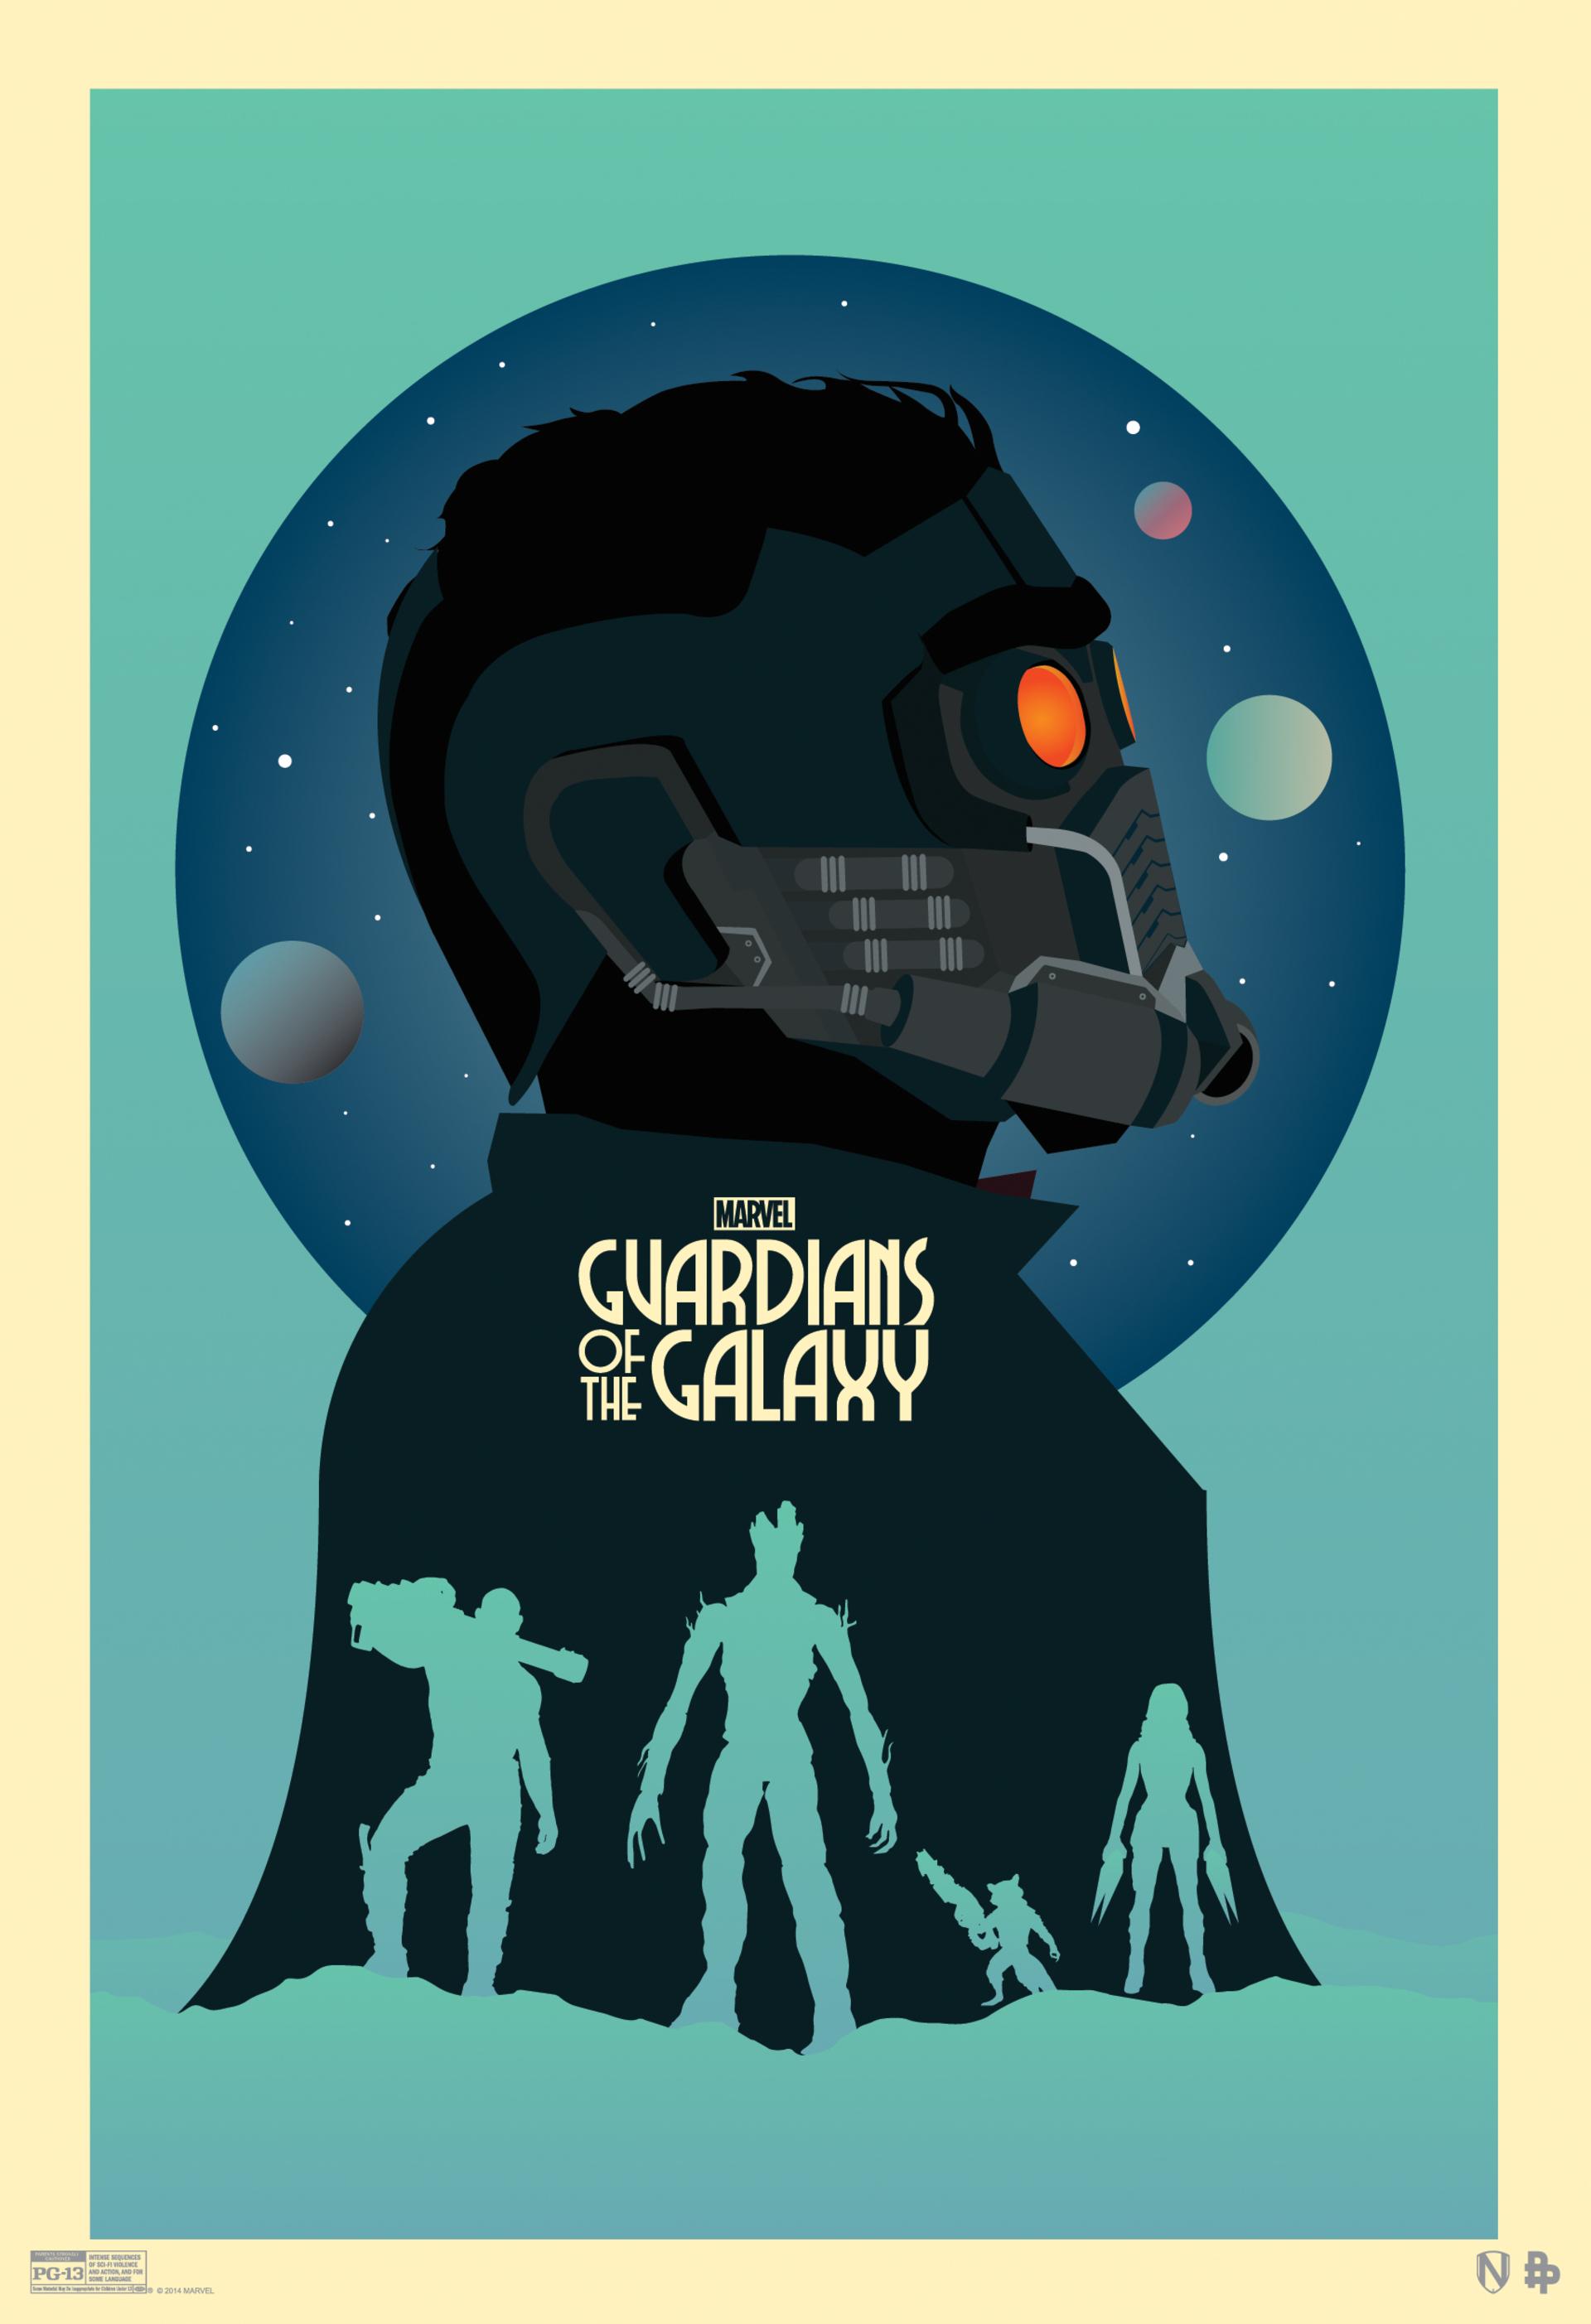 guardiansofthegalaxy-blueretroposter.jpg